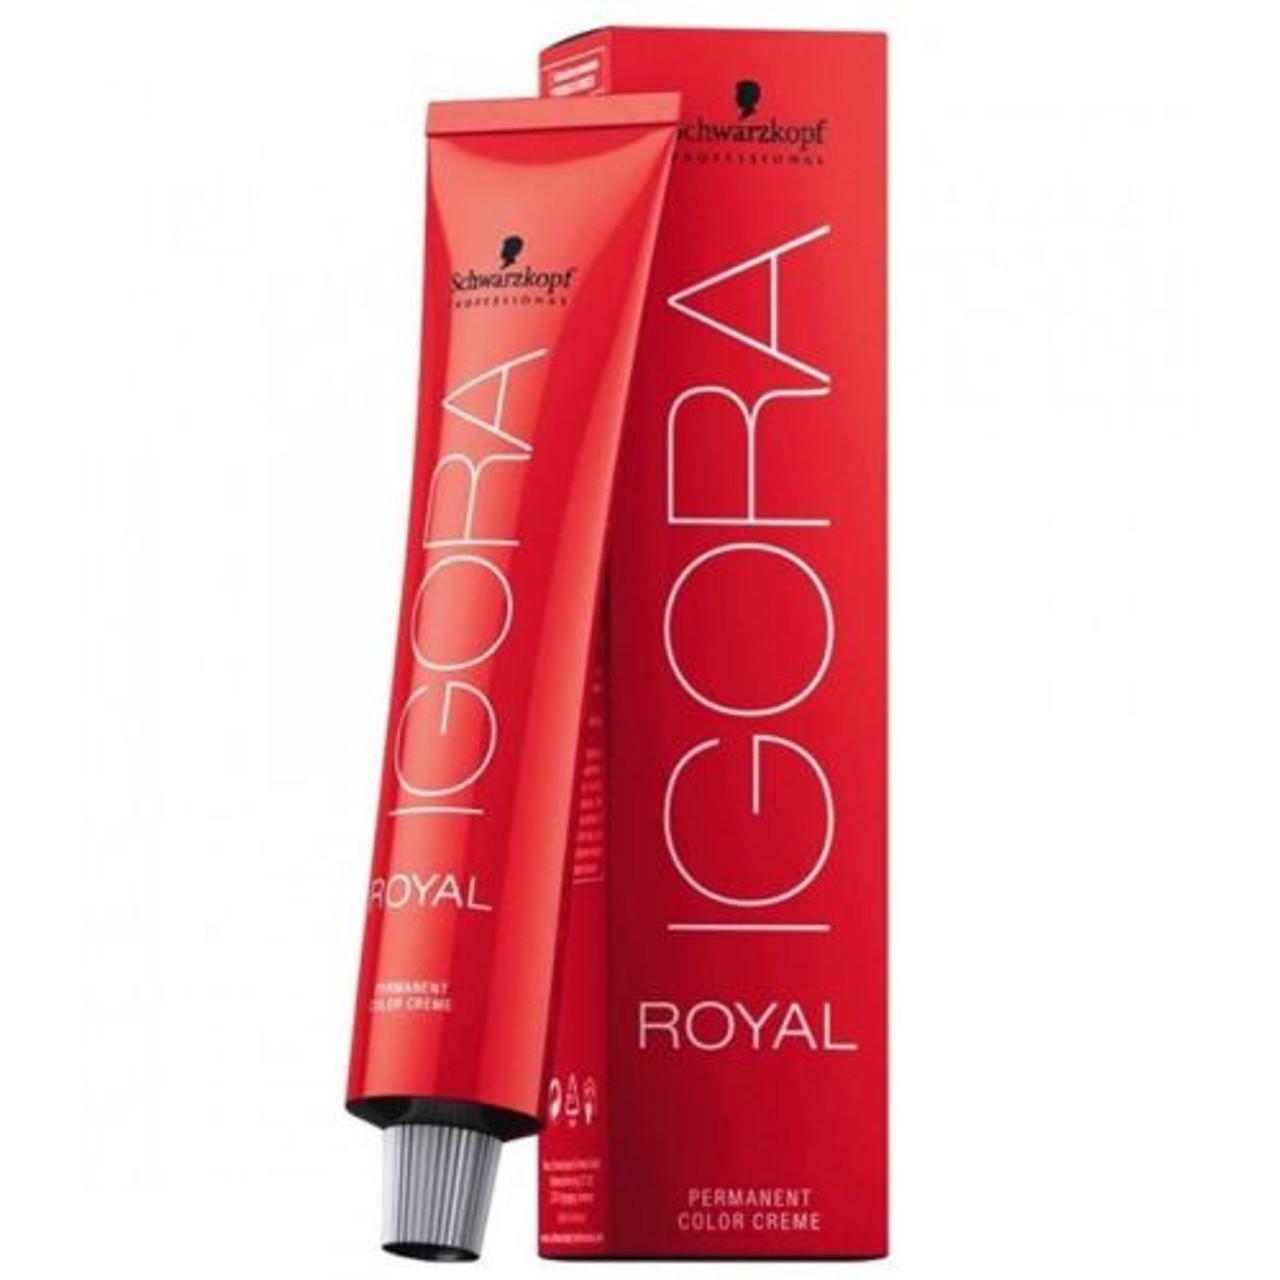 Schwarzkopf Igora Royal Permanent Color Creme - 9-4 Extra Light Beige blonde